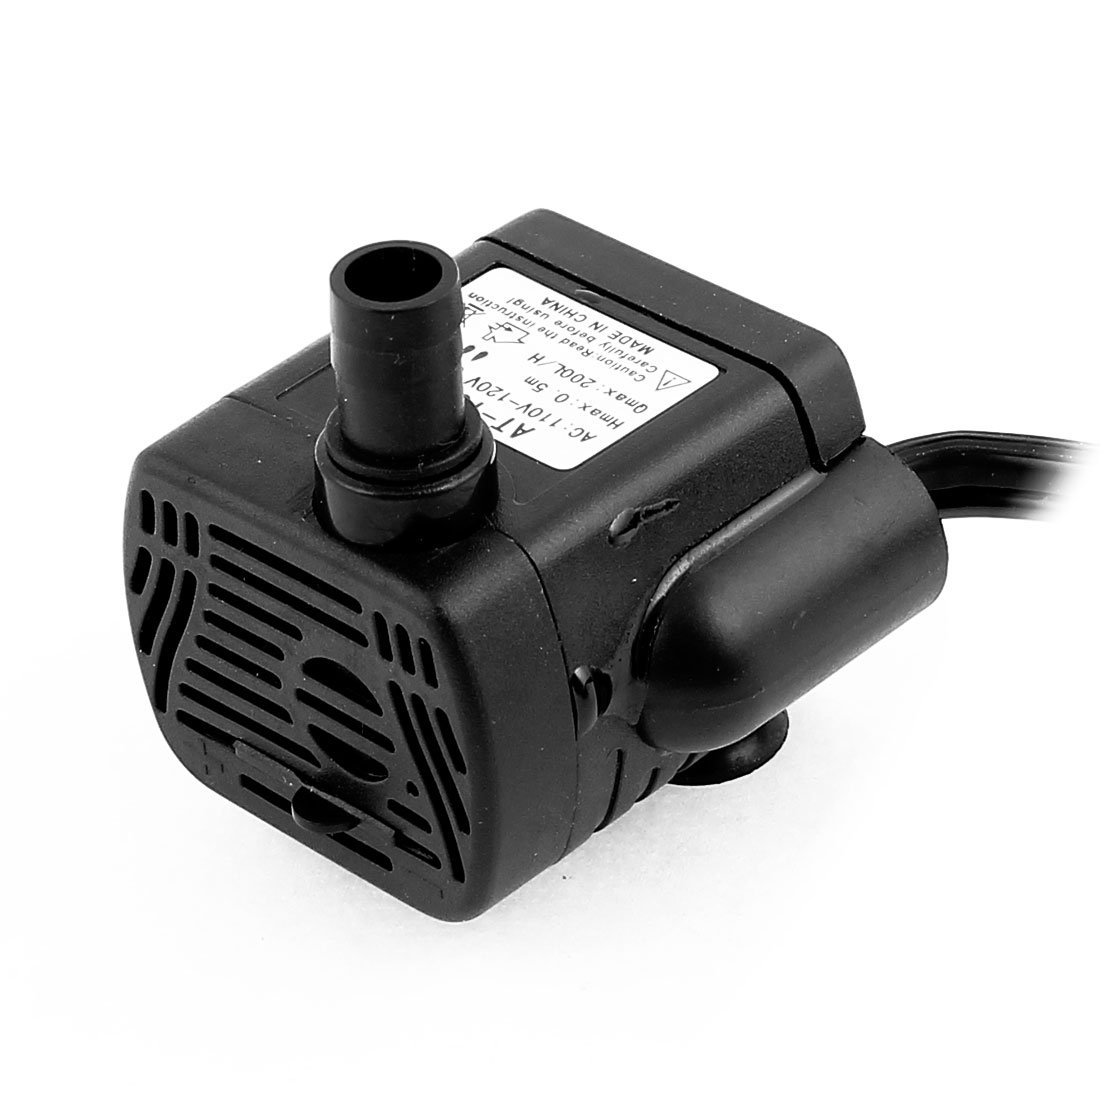 uxcell AC 110V-120V US Plug 3W Electric Mini Submersible Water Pump Aquarium Fountain